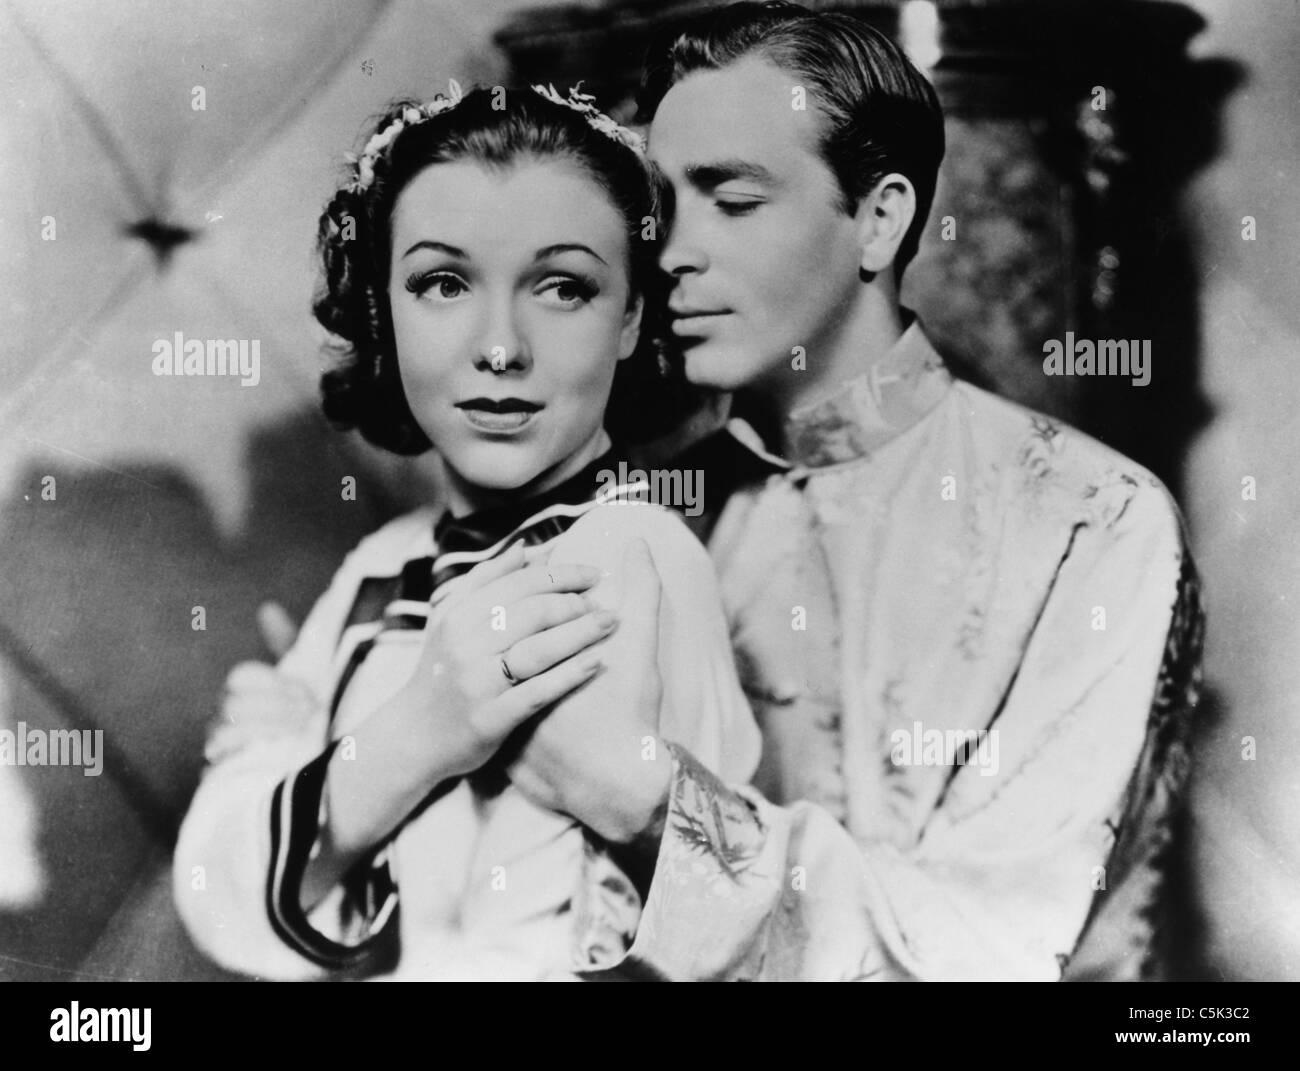 LOST HORIZON (1937) FRANK CAPLA (DIR) 021 MOVIESTORE COLLECTION LTD - Stock Image